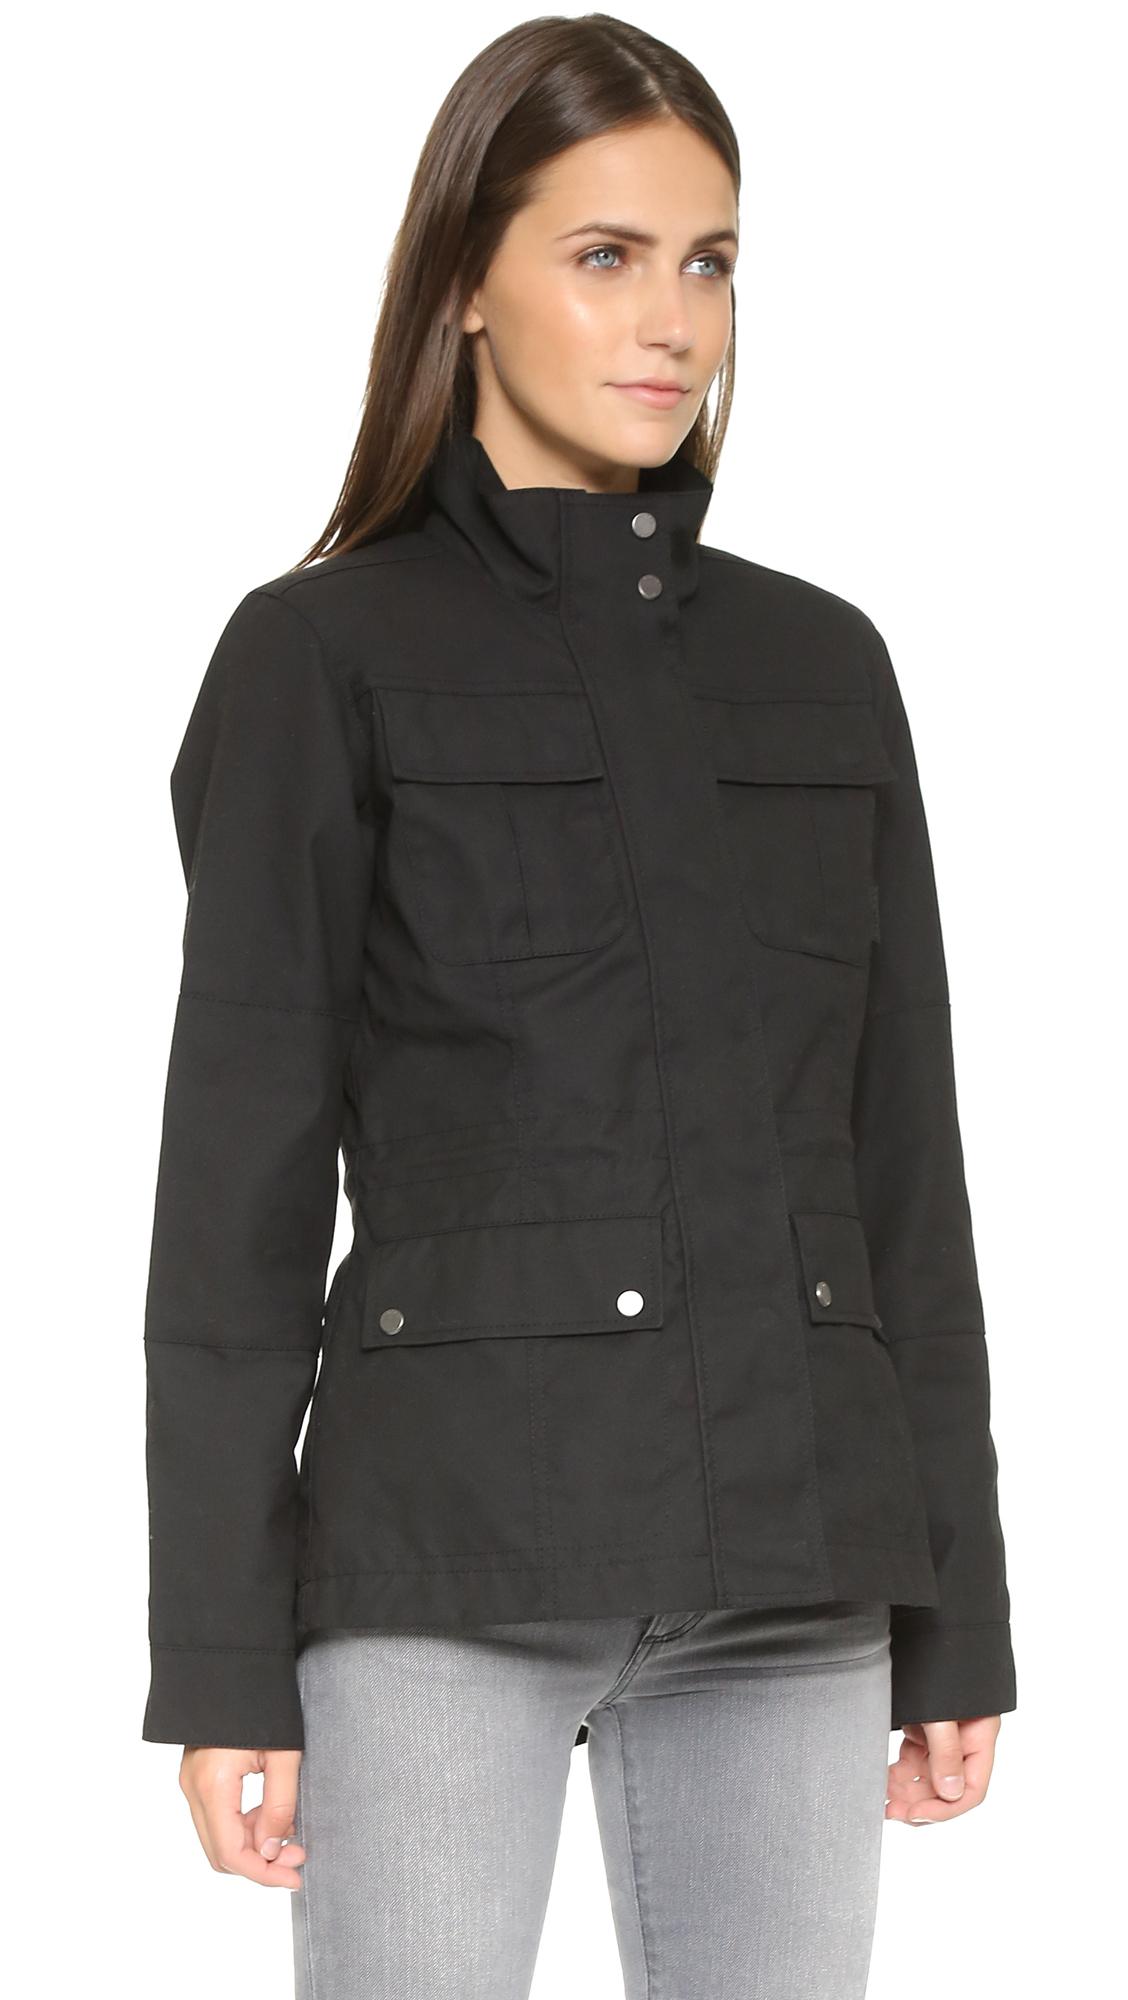 Hunter Womens Original Winter Utility Jacket Black In